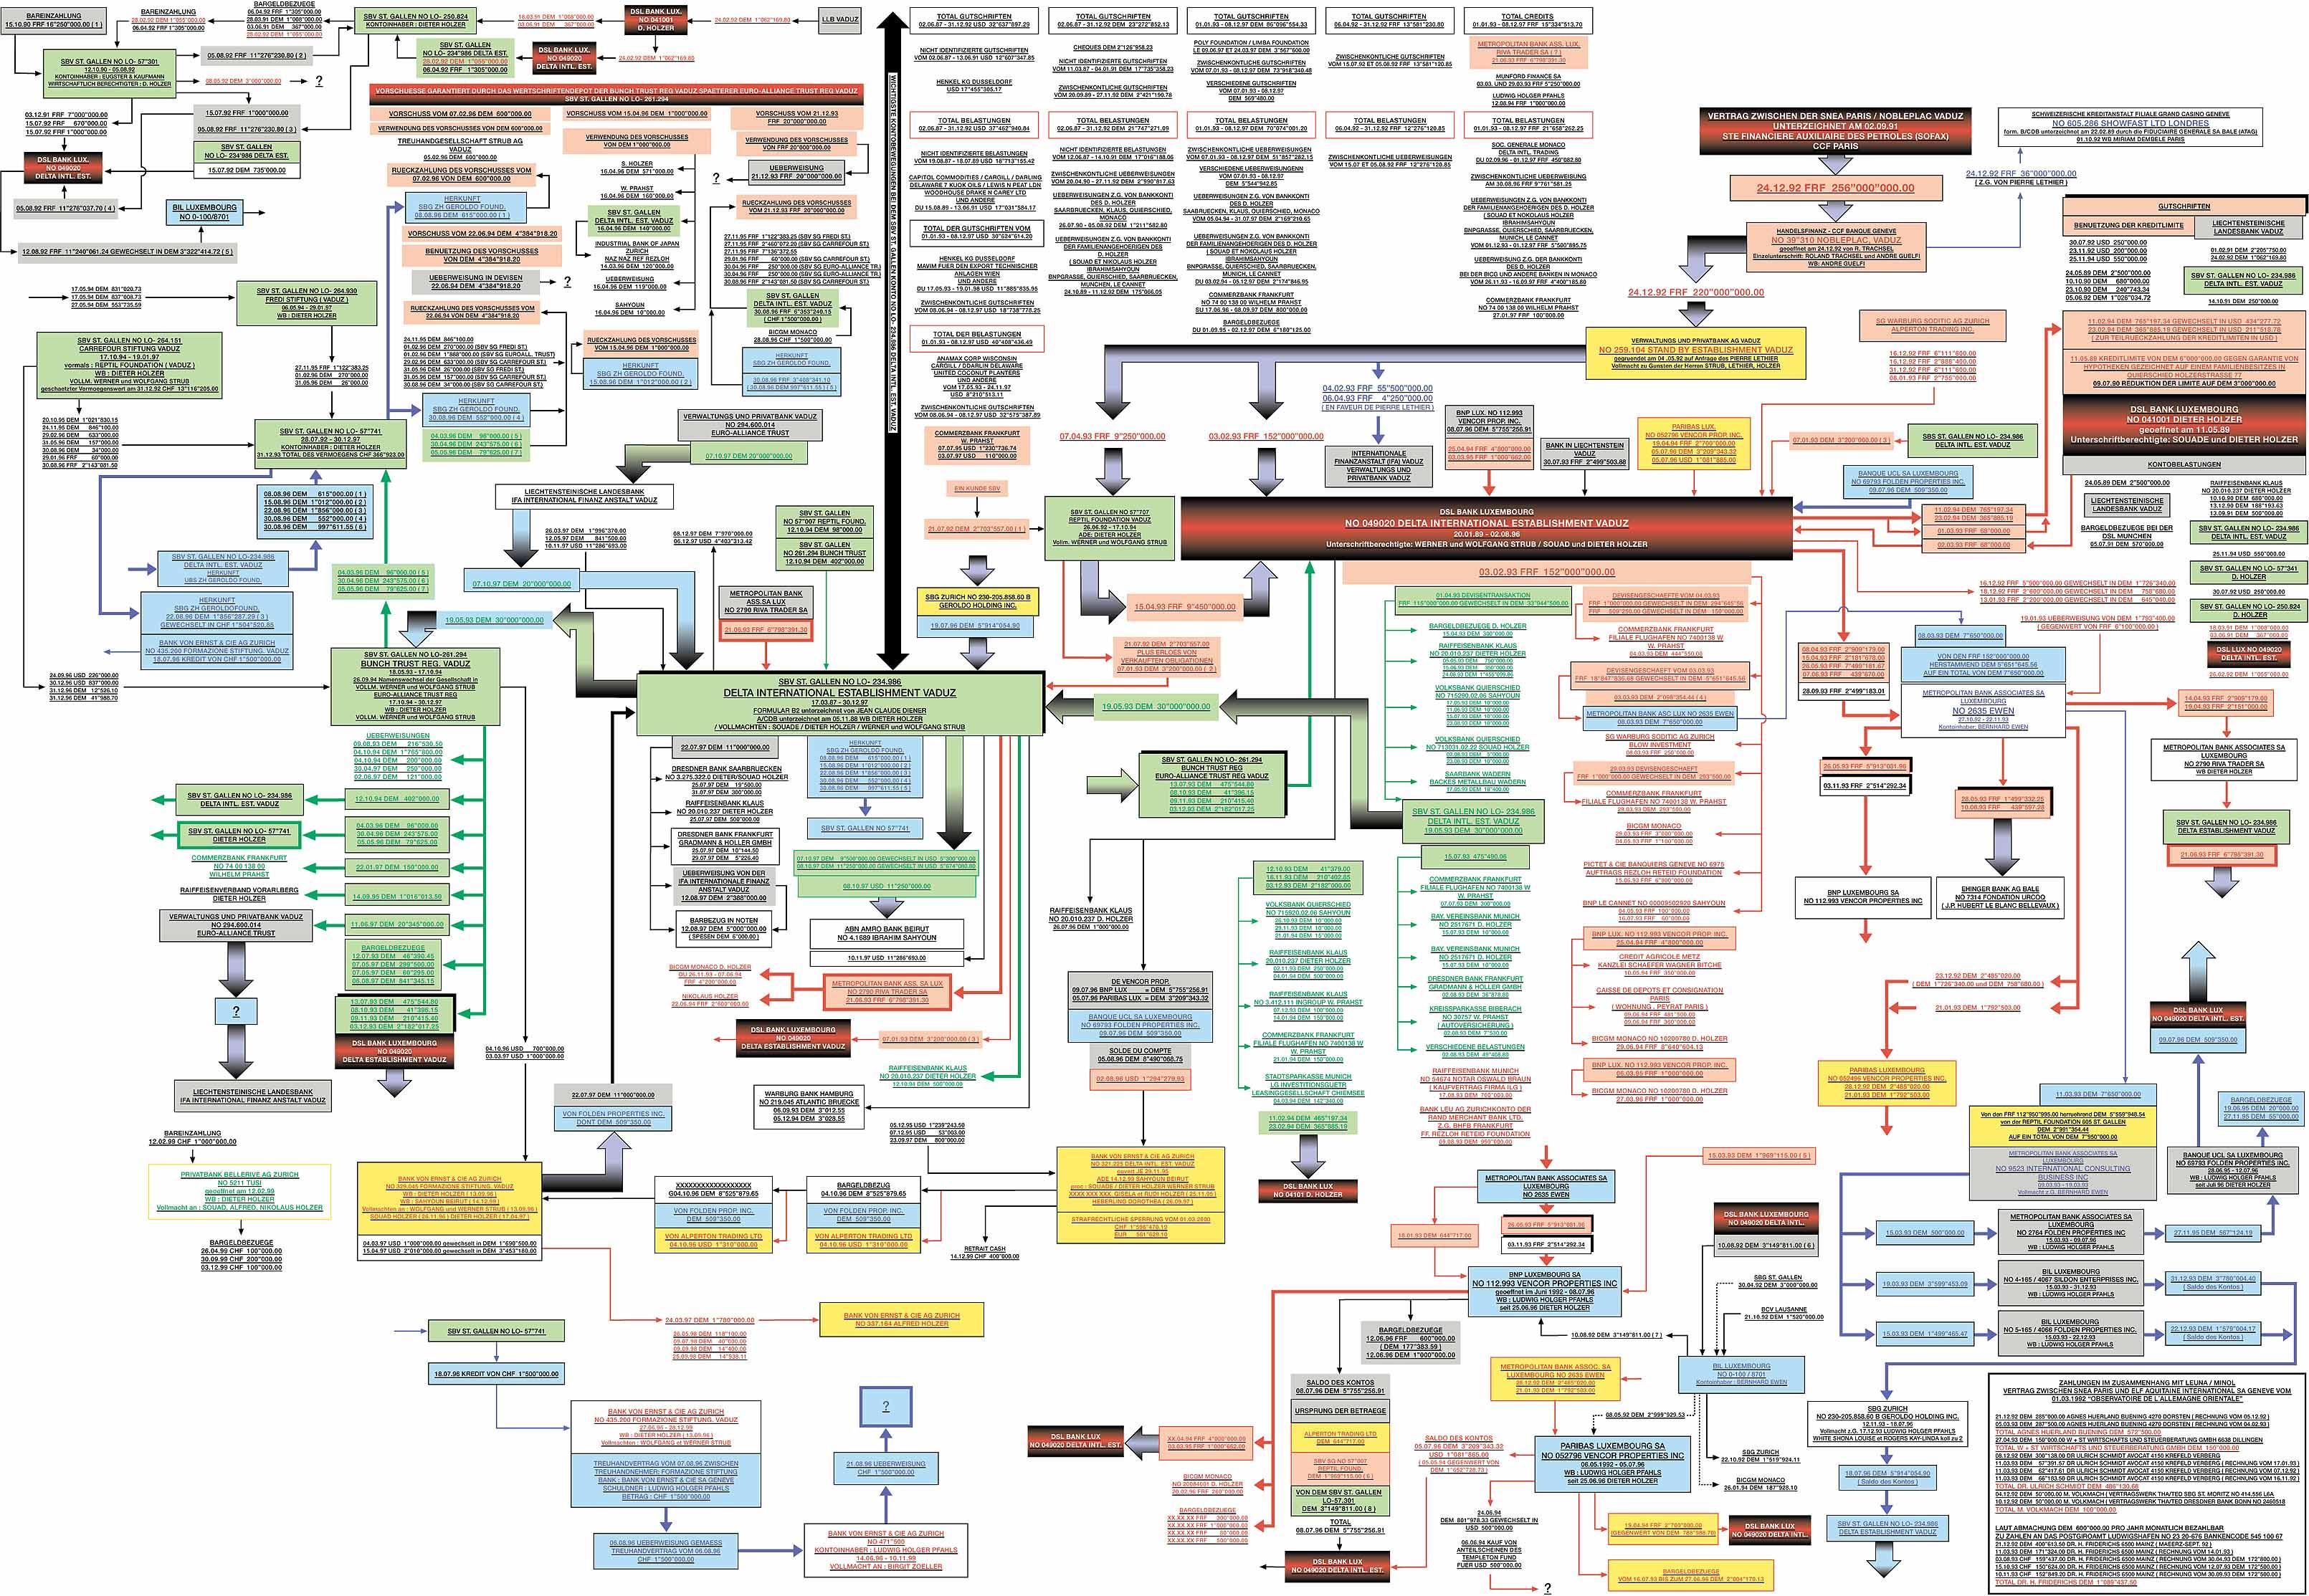 Geldwaesche-Grafik